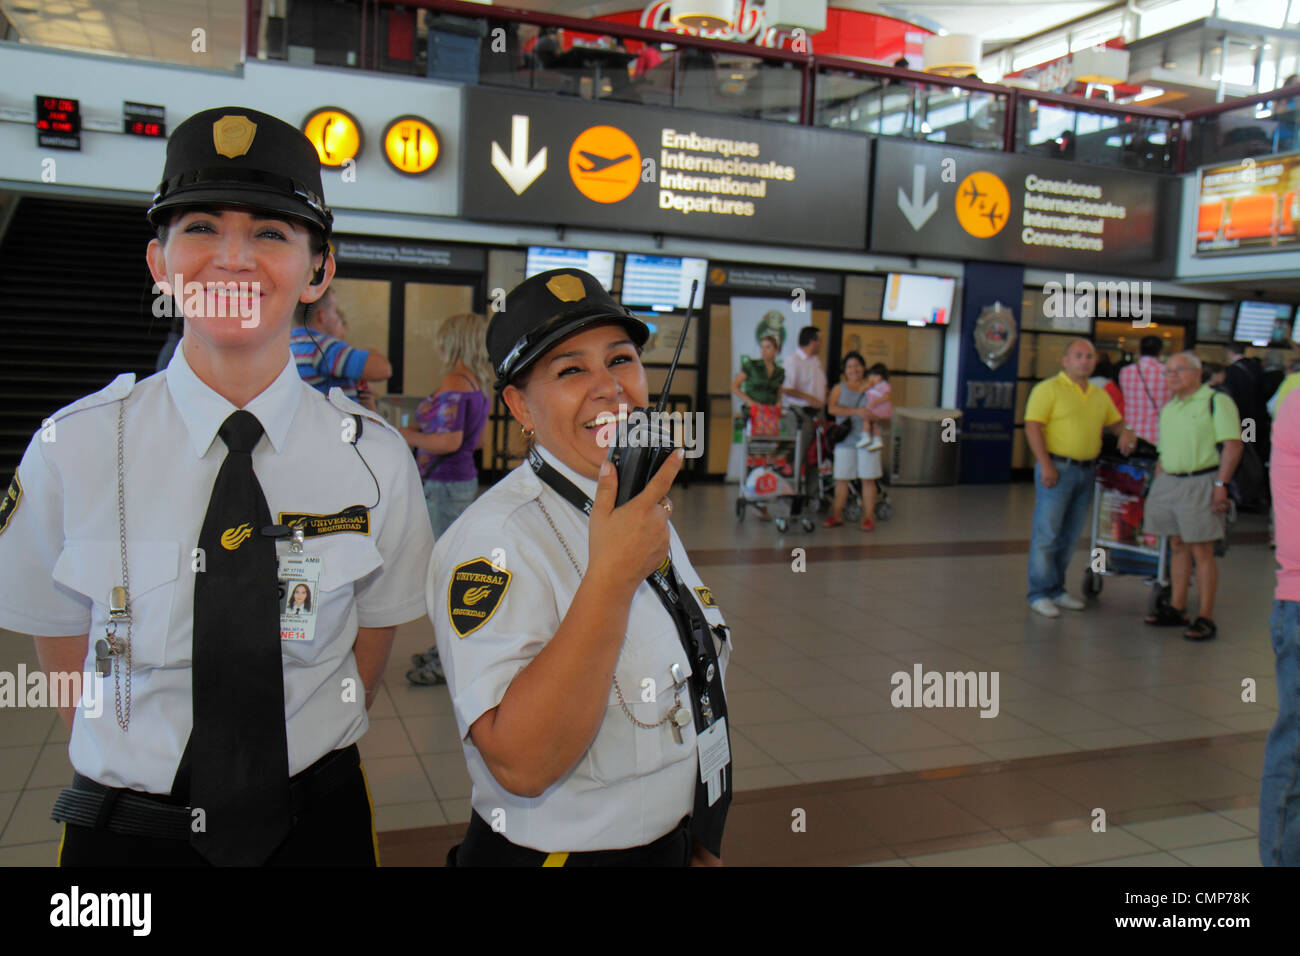 Santiago Chile Comodoro Arturo Merino Benítez International Airport SCL aviation passenger terminal Hispanic - Stock Image